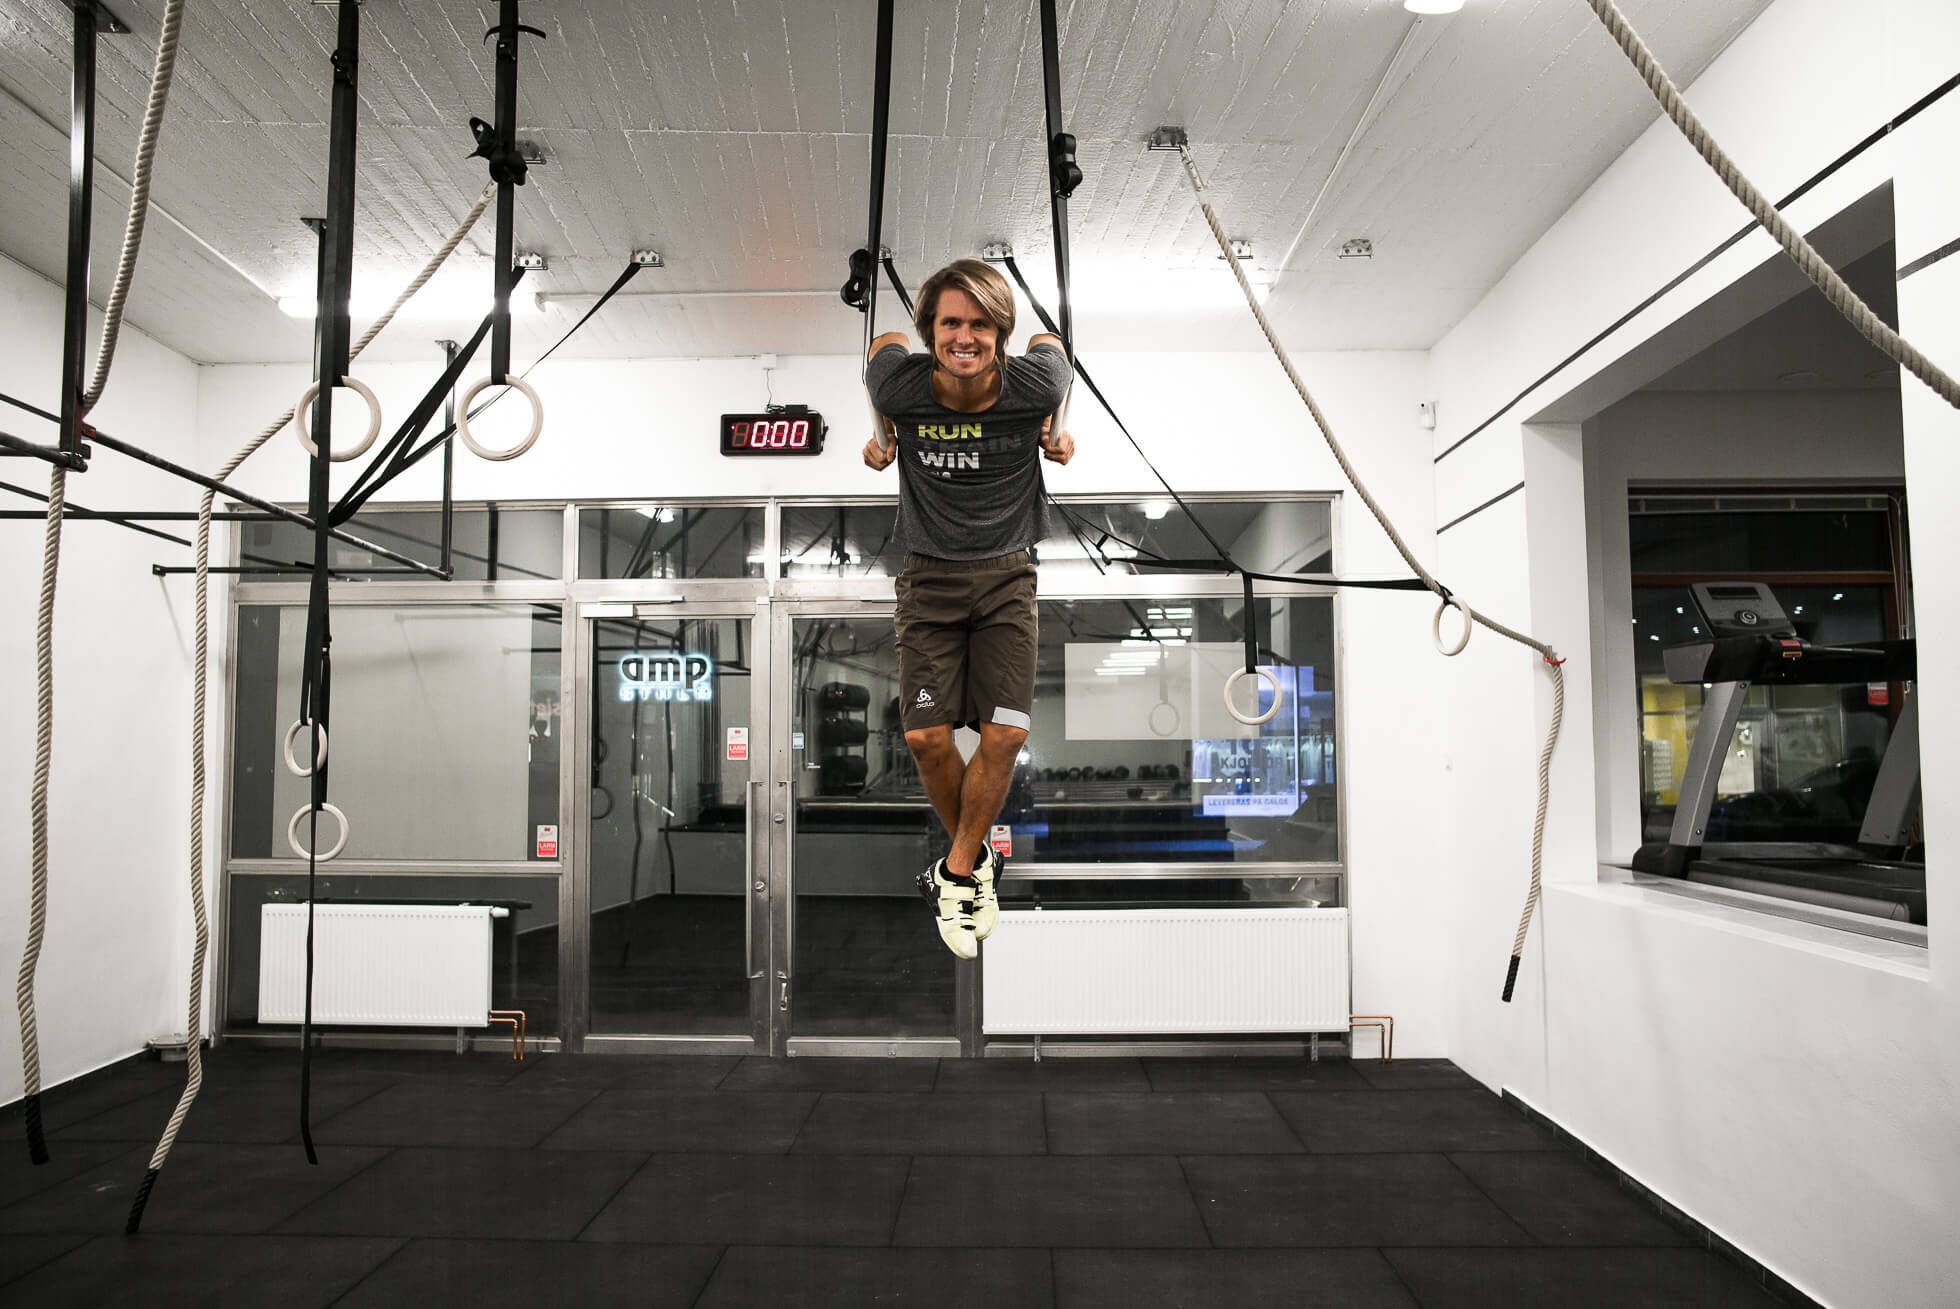 janni-deler-gym-crossfit-atum-stockholmL1000208